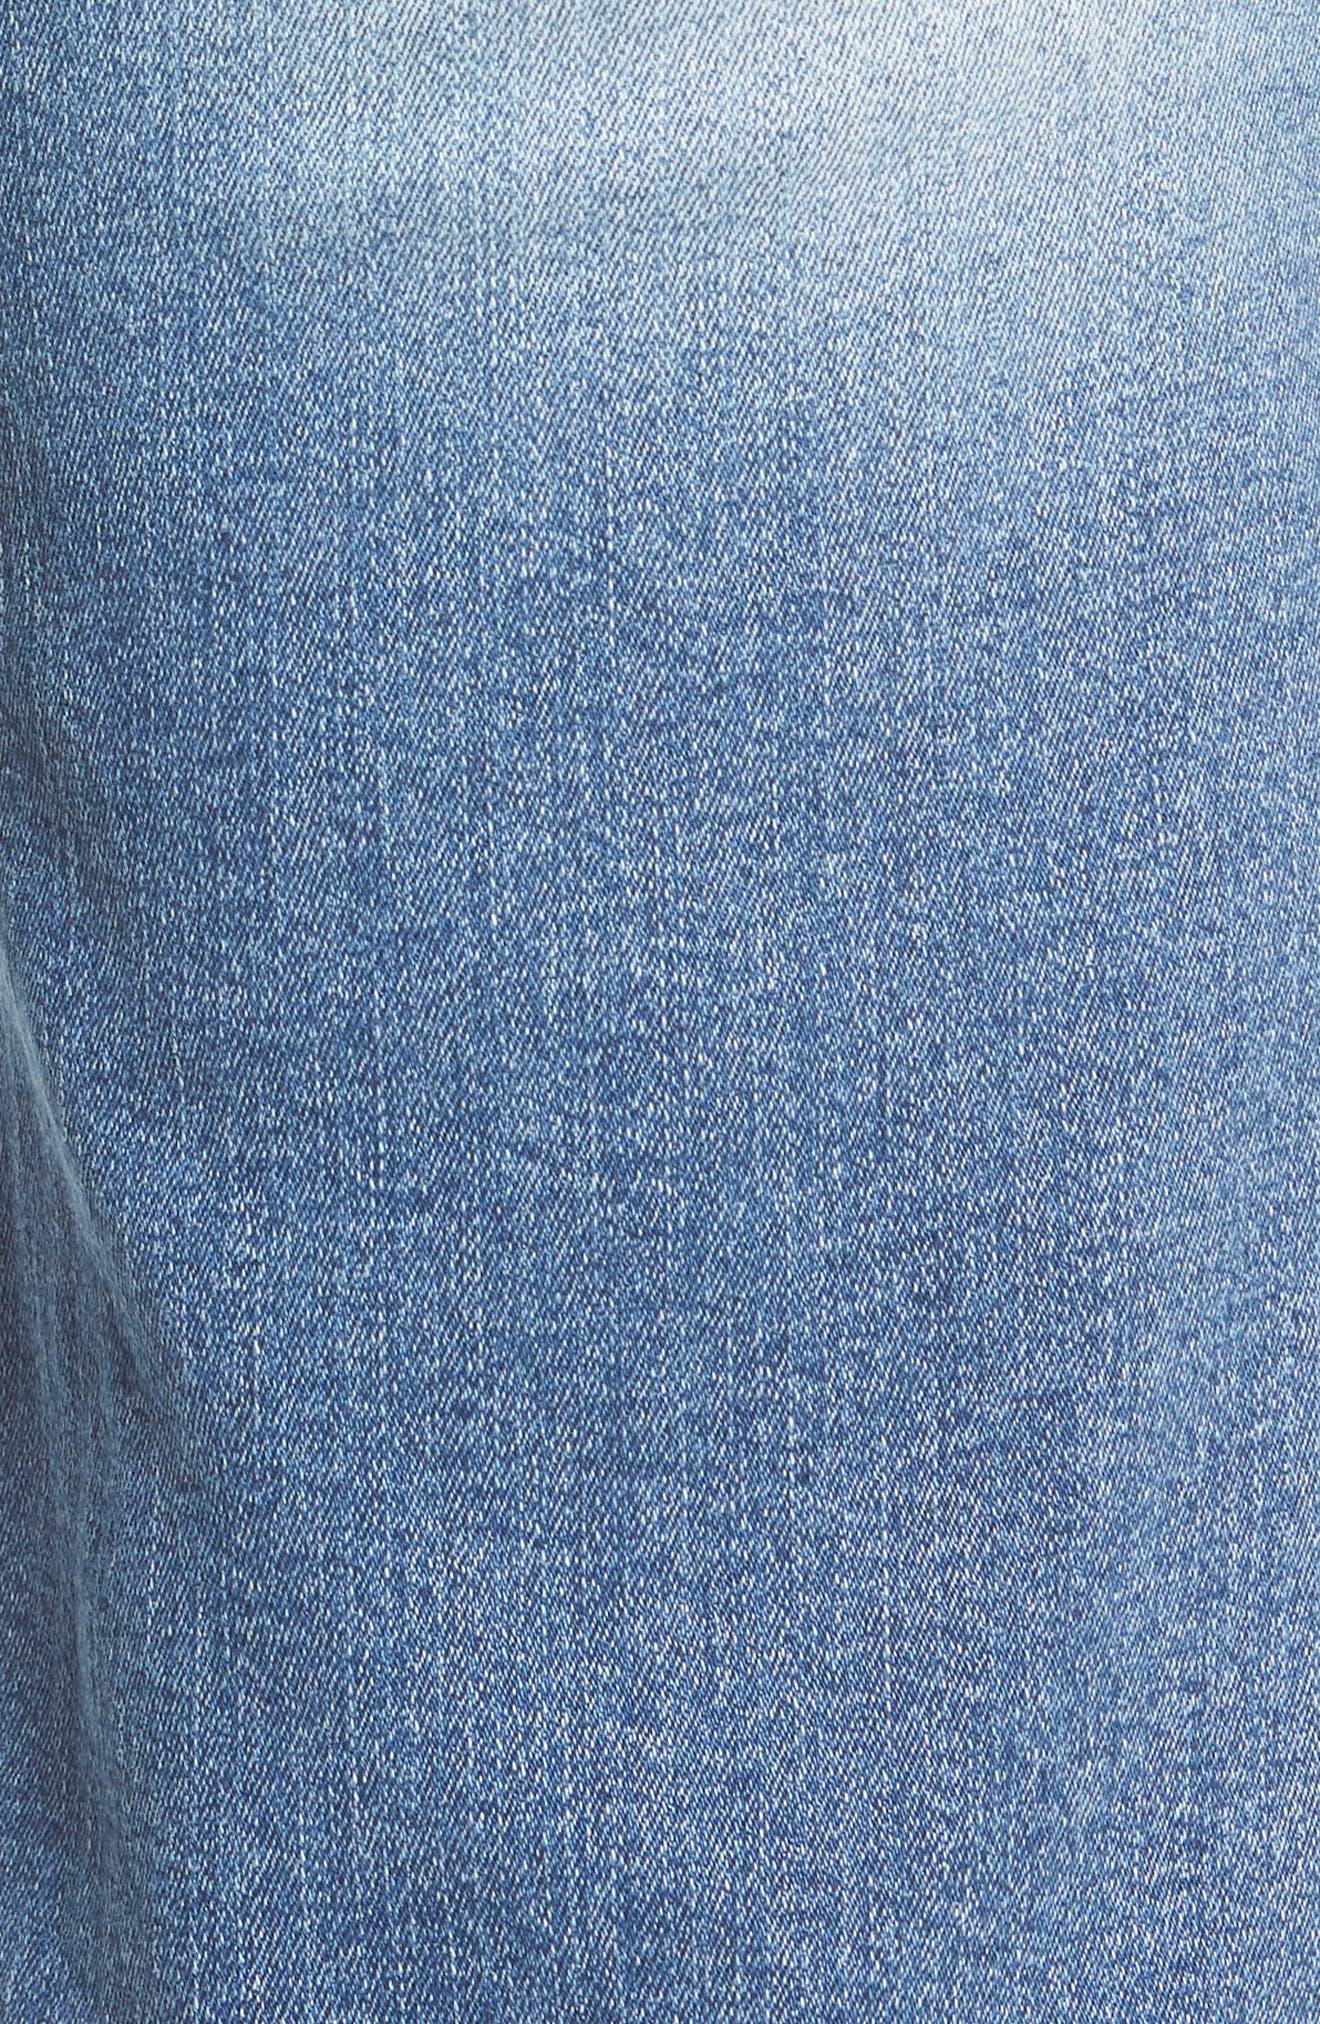 Alternate Image 5  - Wit & Wisdom Ab-solution Ripped Denim Bermuda Shorts (Regular & Petite) (Nordstrom Exclusive)